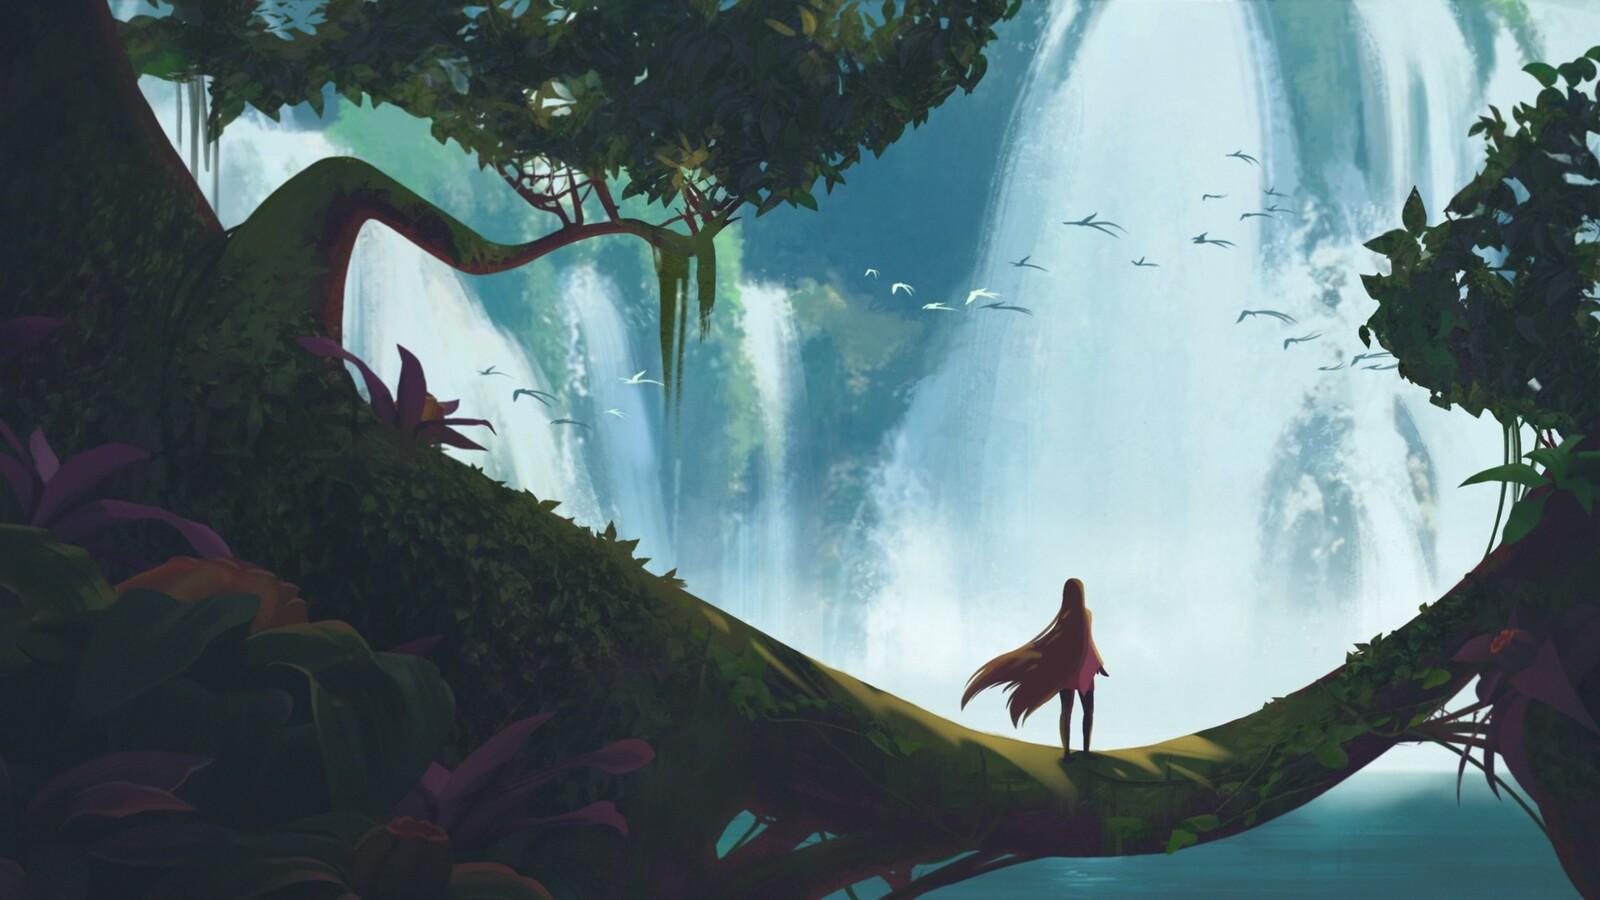 girl-waterfall-fantasy-art.jpg